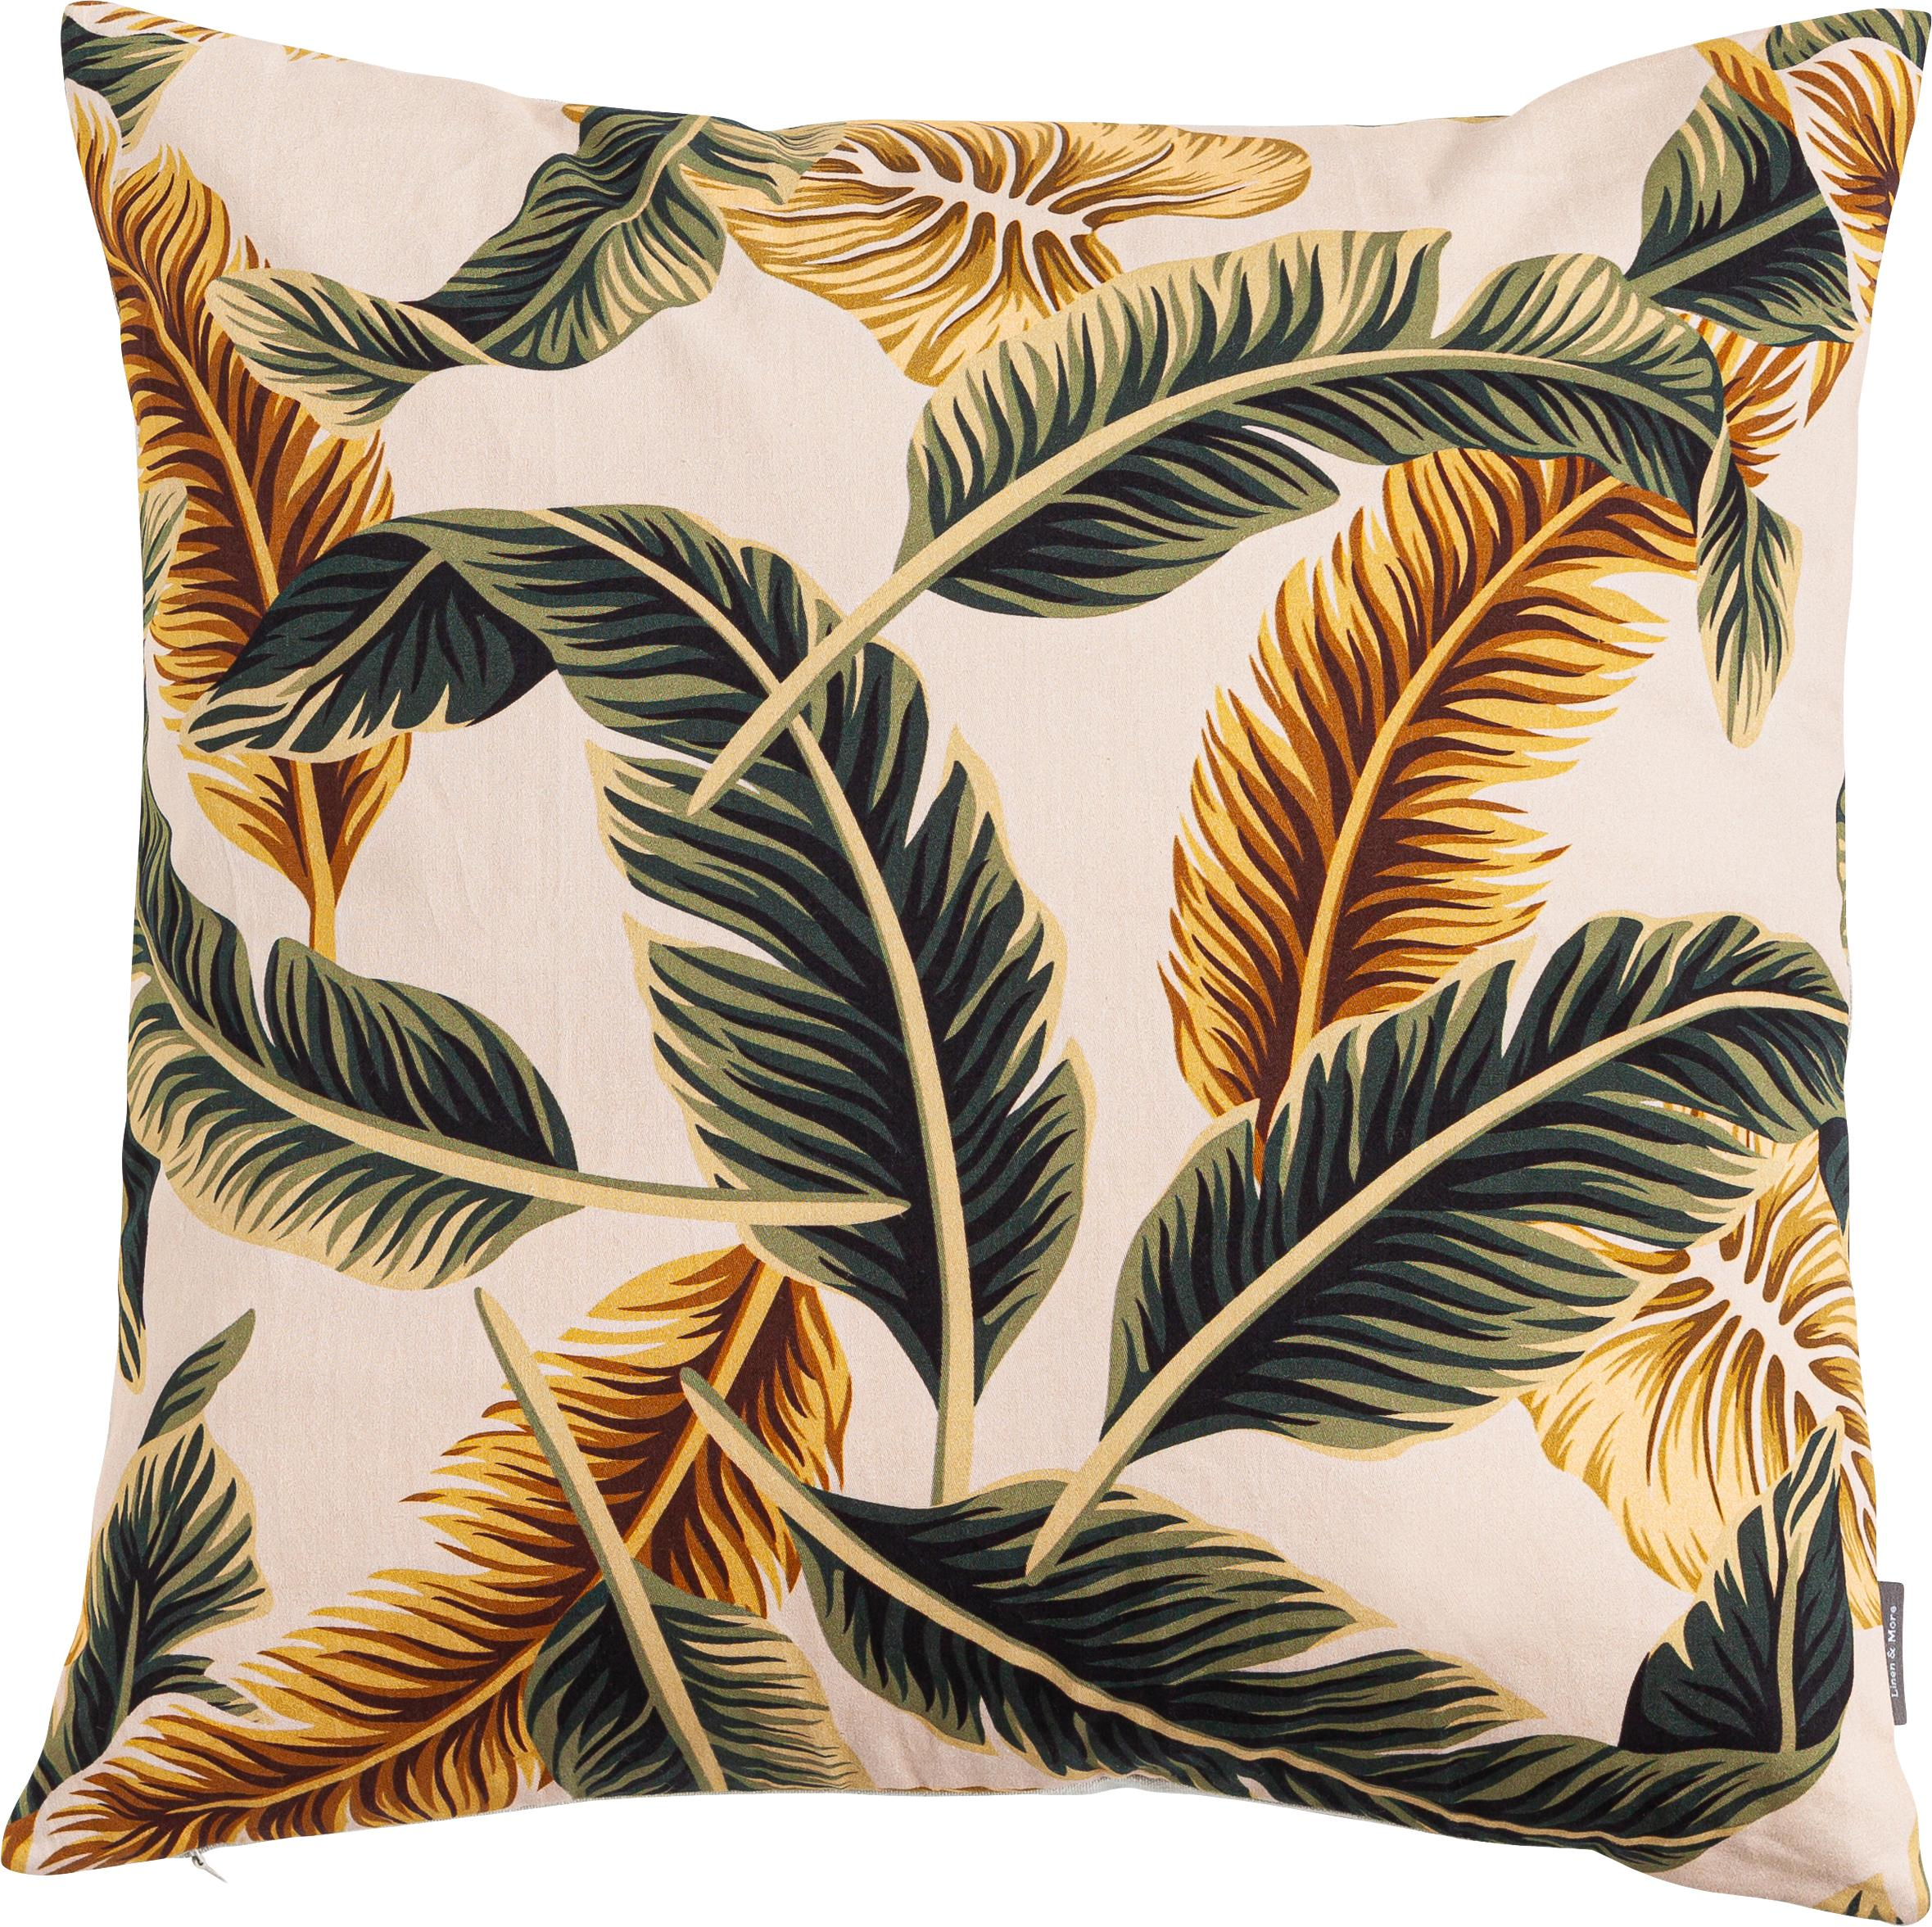 Cuscino con imbottitura Elegant Feather, 100% cotone, Beige, verde, giallo dorato, Larg. 45 x Lung. 45 cm